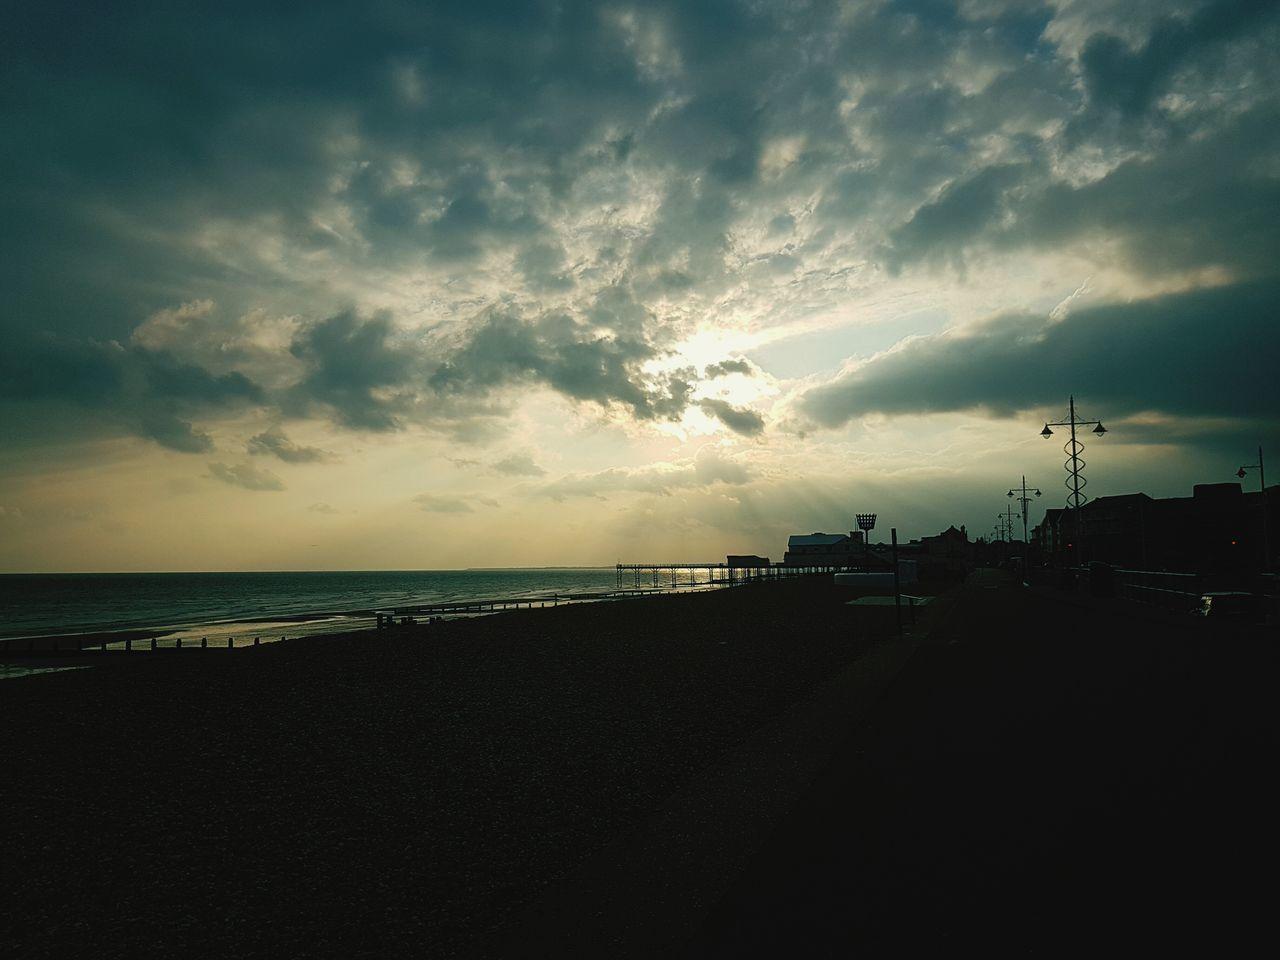 Sea Water Horizon Over Water Beach Tranquil Scene Tranquility Scenics Sky Calm Sunset Dusk Beauty In Nature Shore Cloud - Sky Idyllic Nature Cloud Coastline Ocean The Way Forward Bognor Pier